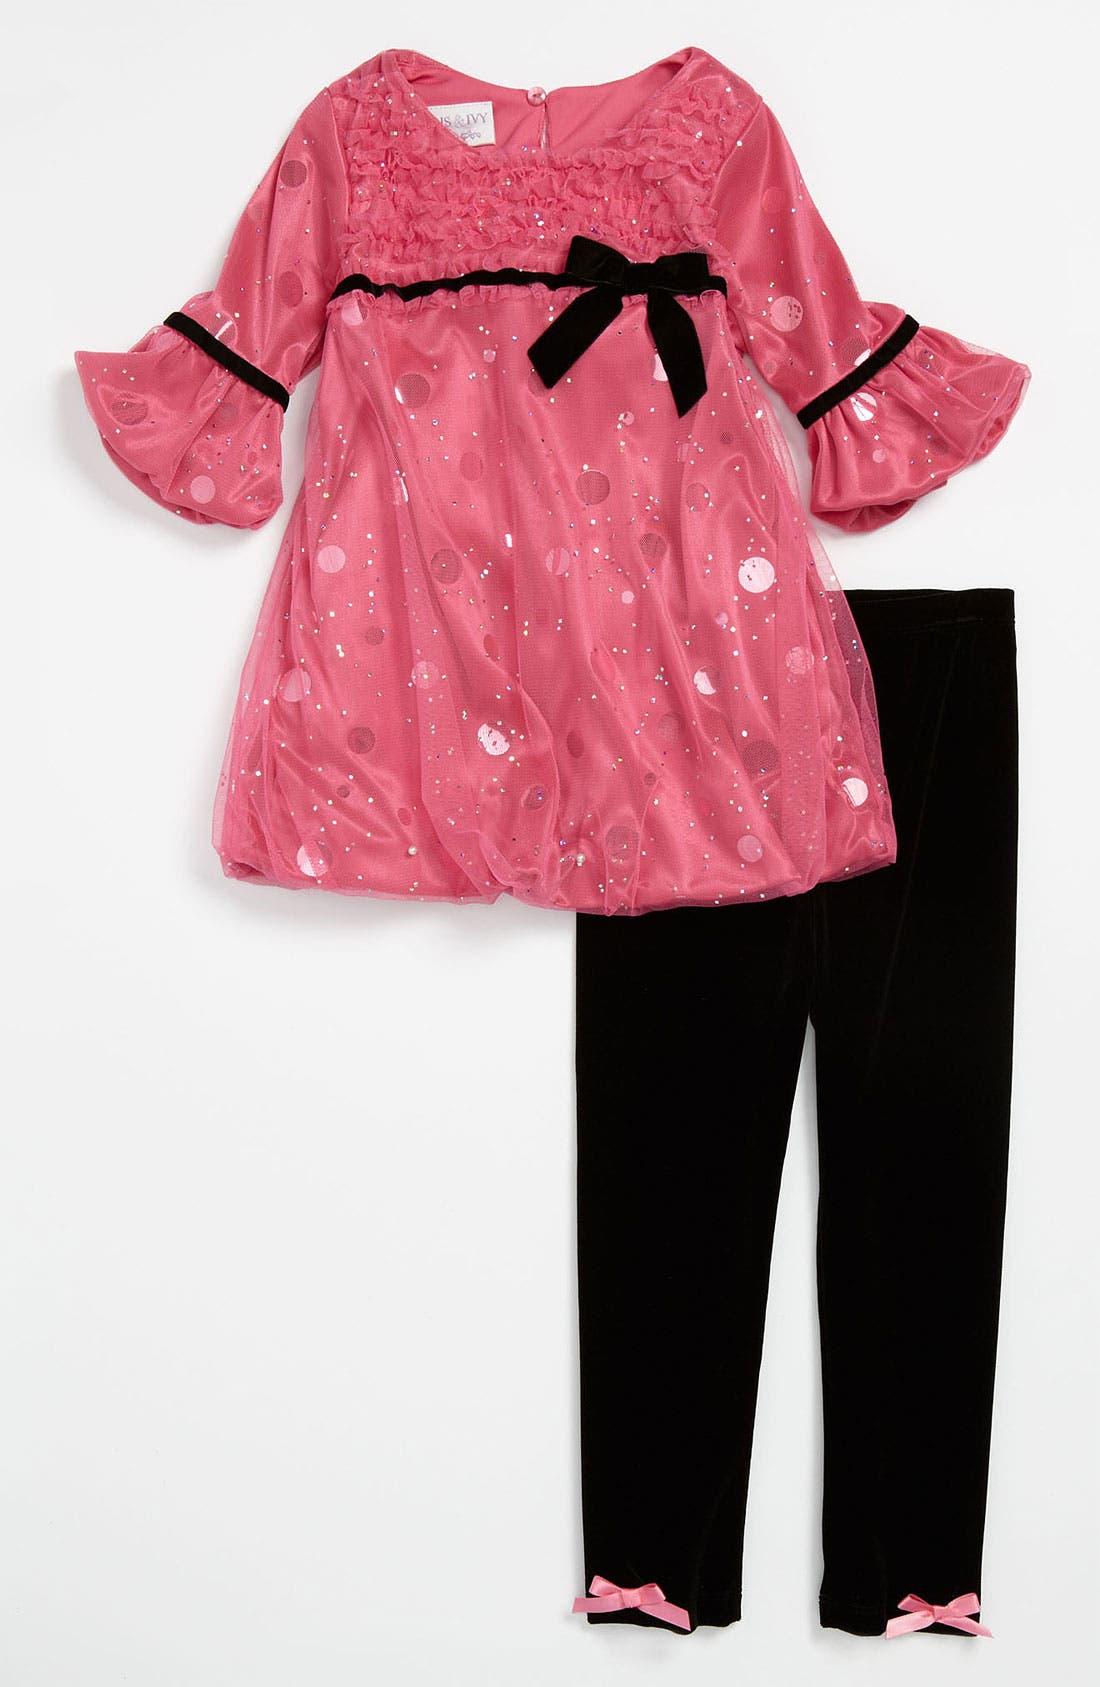 Main Image - Iris & Ivy Dress & Leggings (Infant)